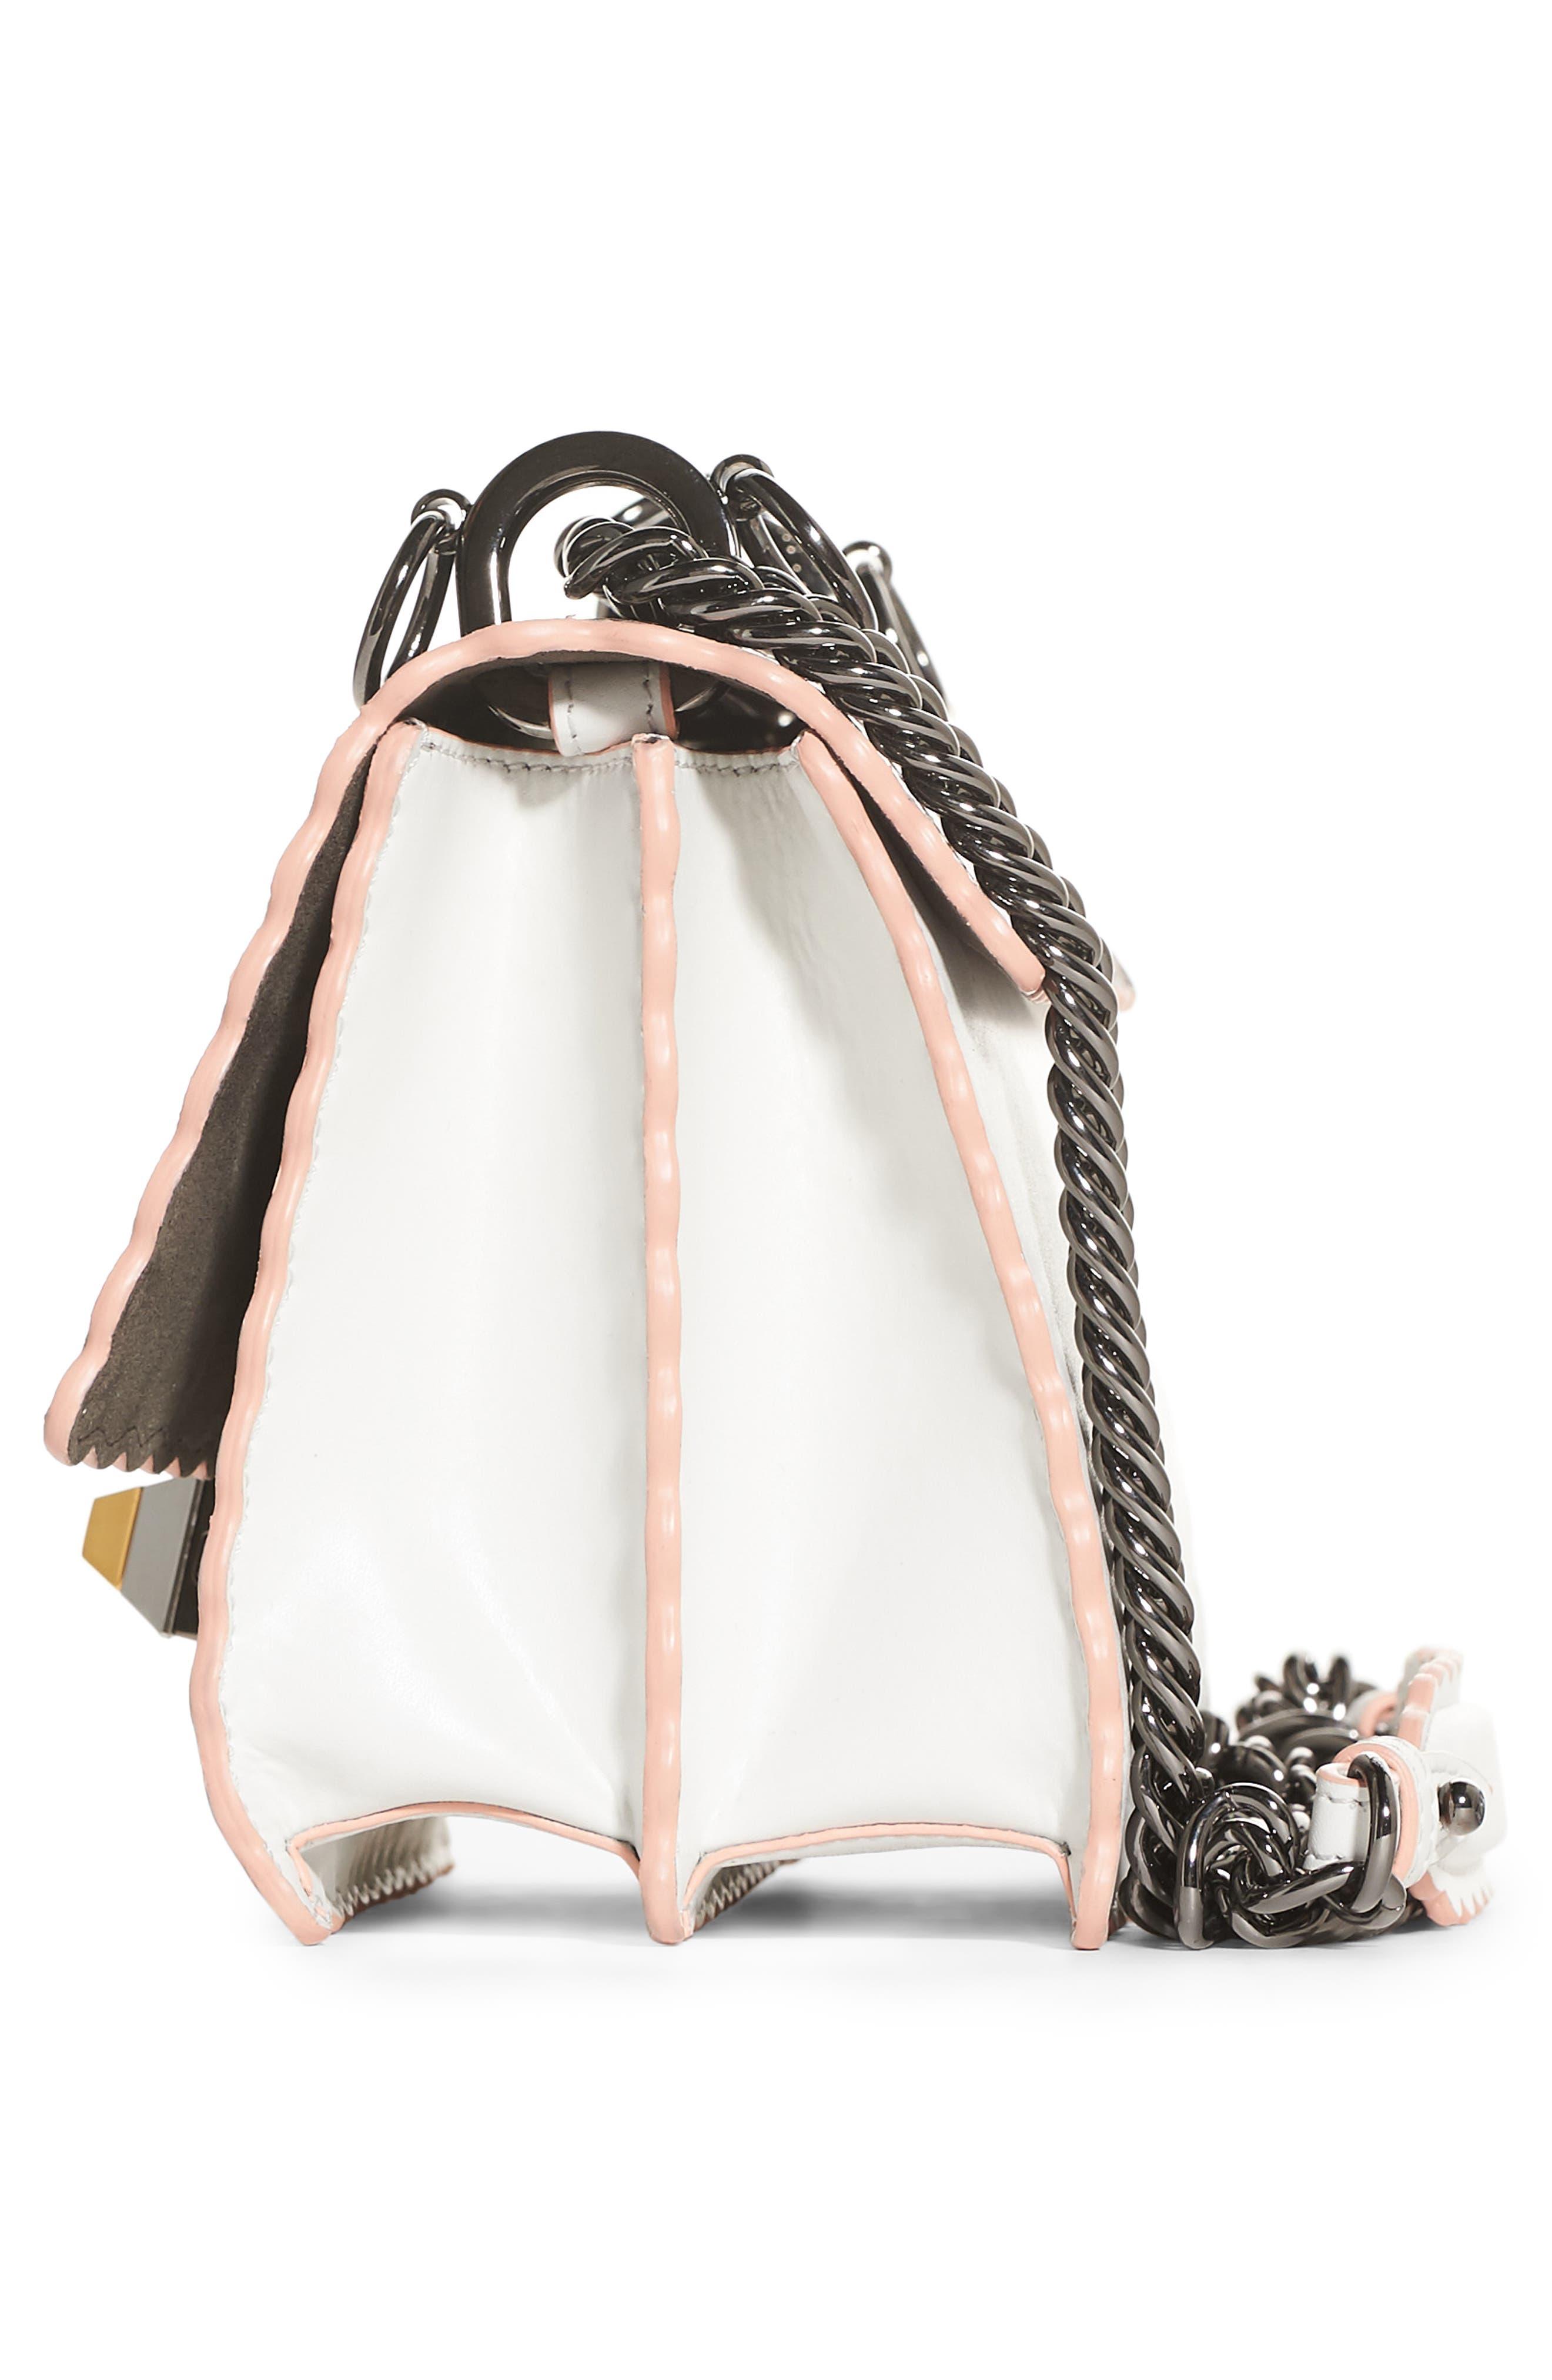 Mini Kan Scallop Genuine Snakeskin & Leather Shoulder Bag,                             Alternate thumbnail 4, color,                             TAUPE/ROMARO/WHITE